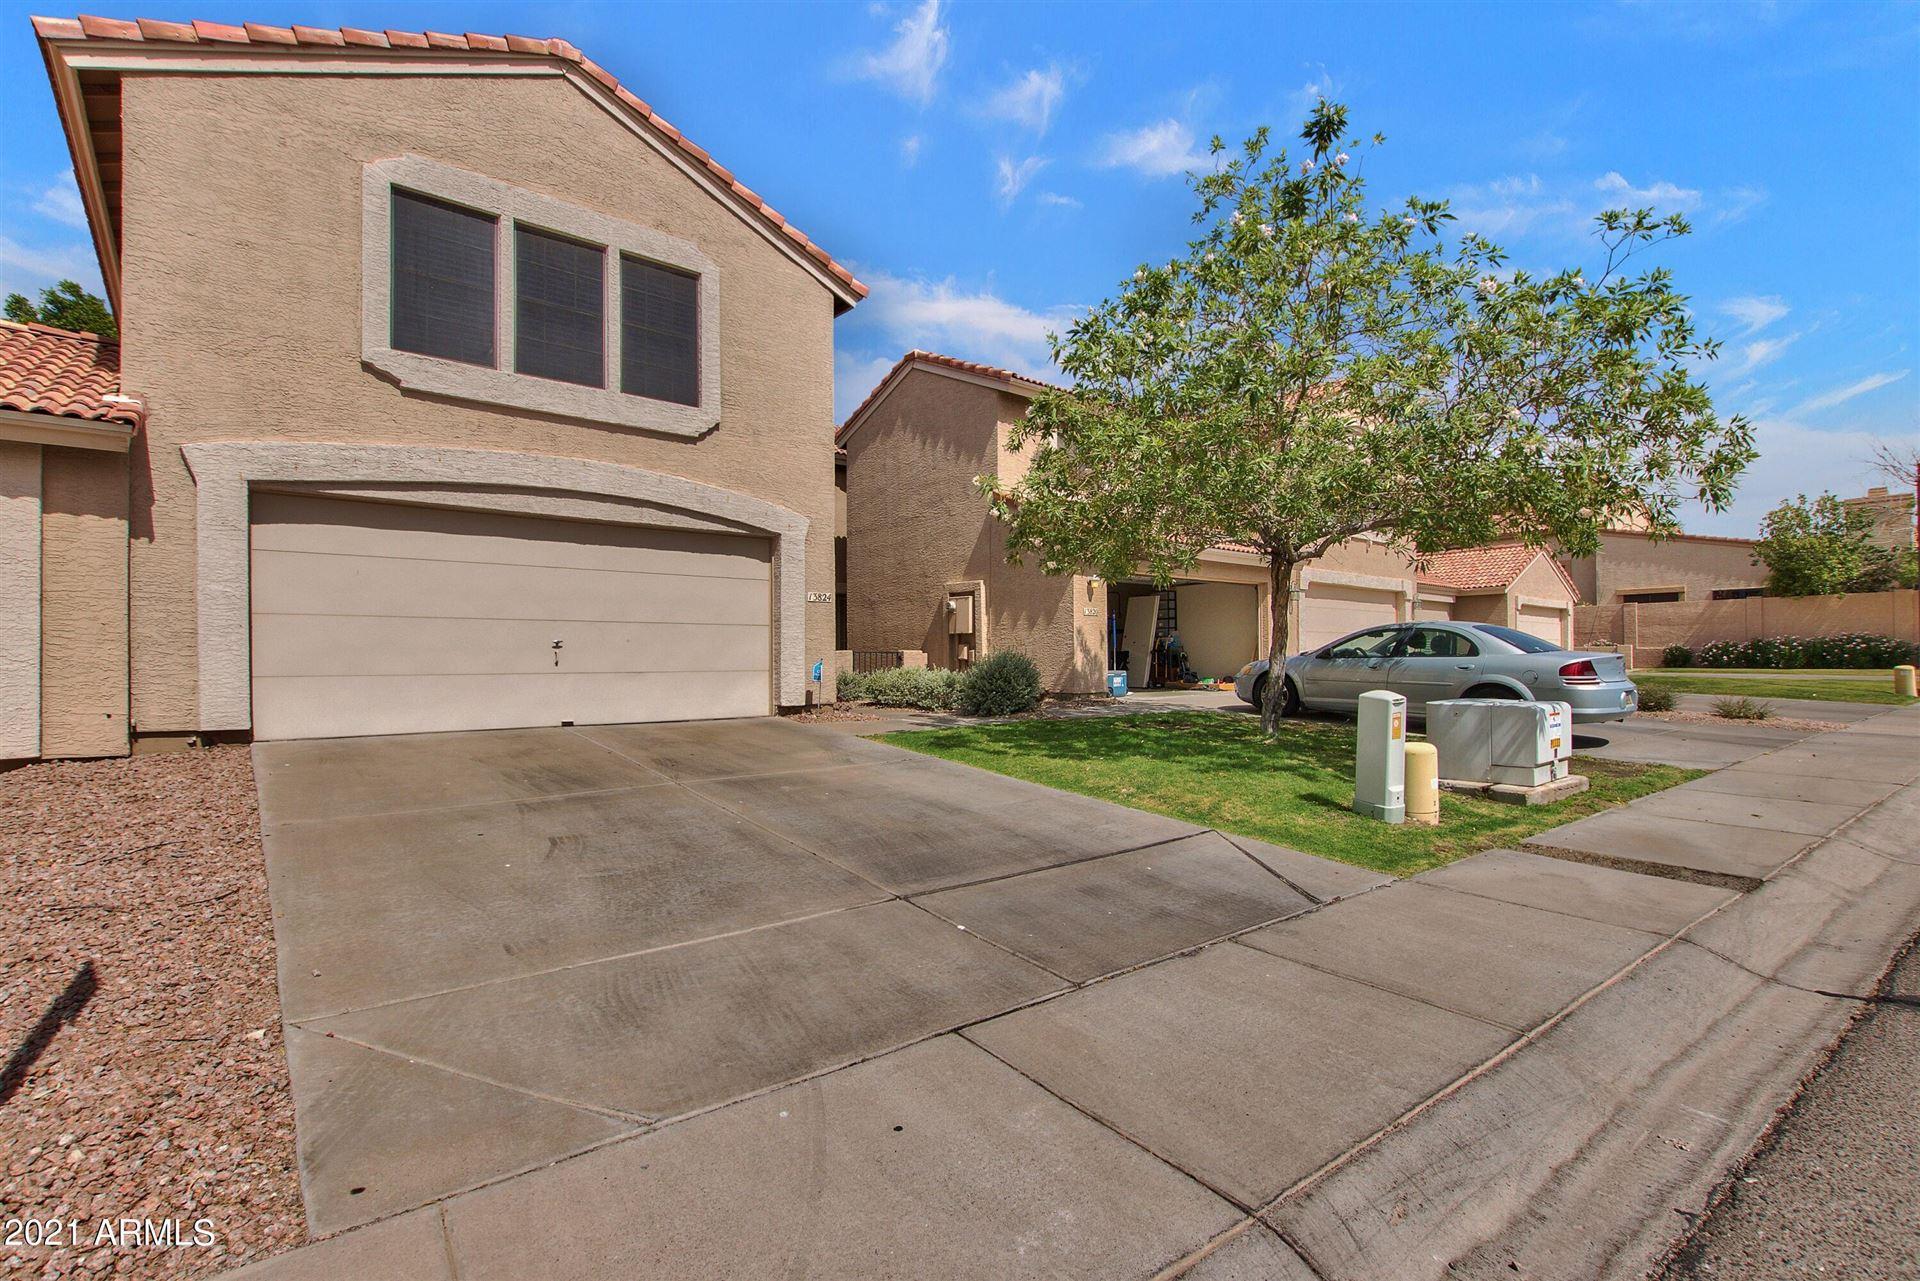 13824 S 41ST Way, Phoenix, AZ 85044 - MLS#: 6247750